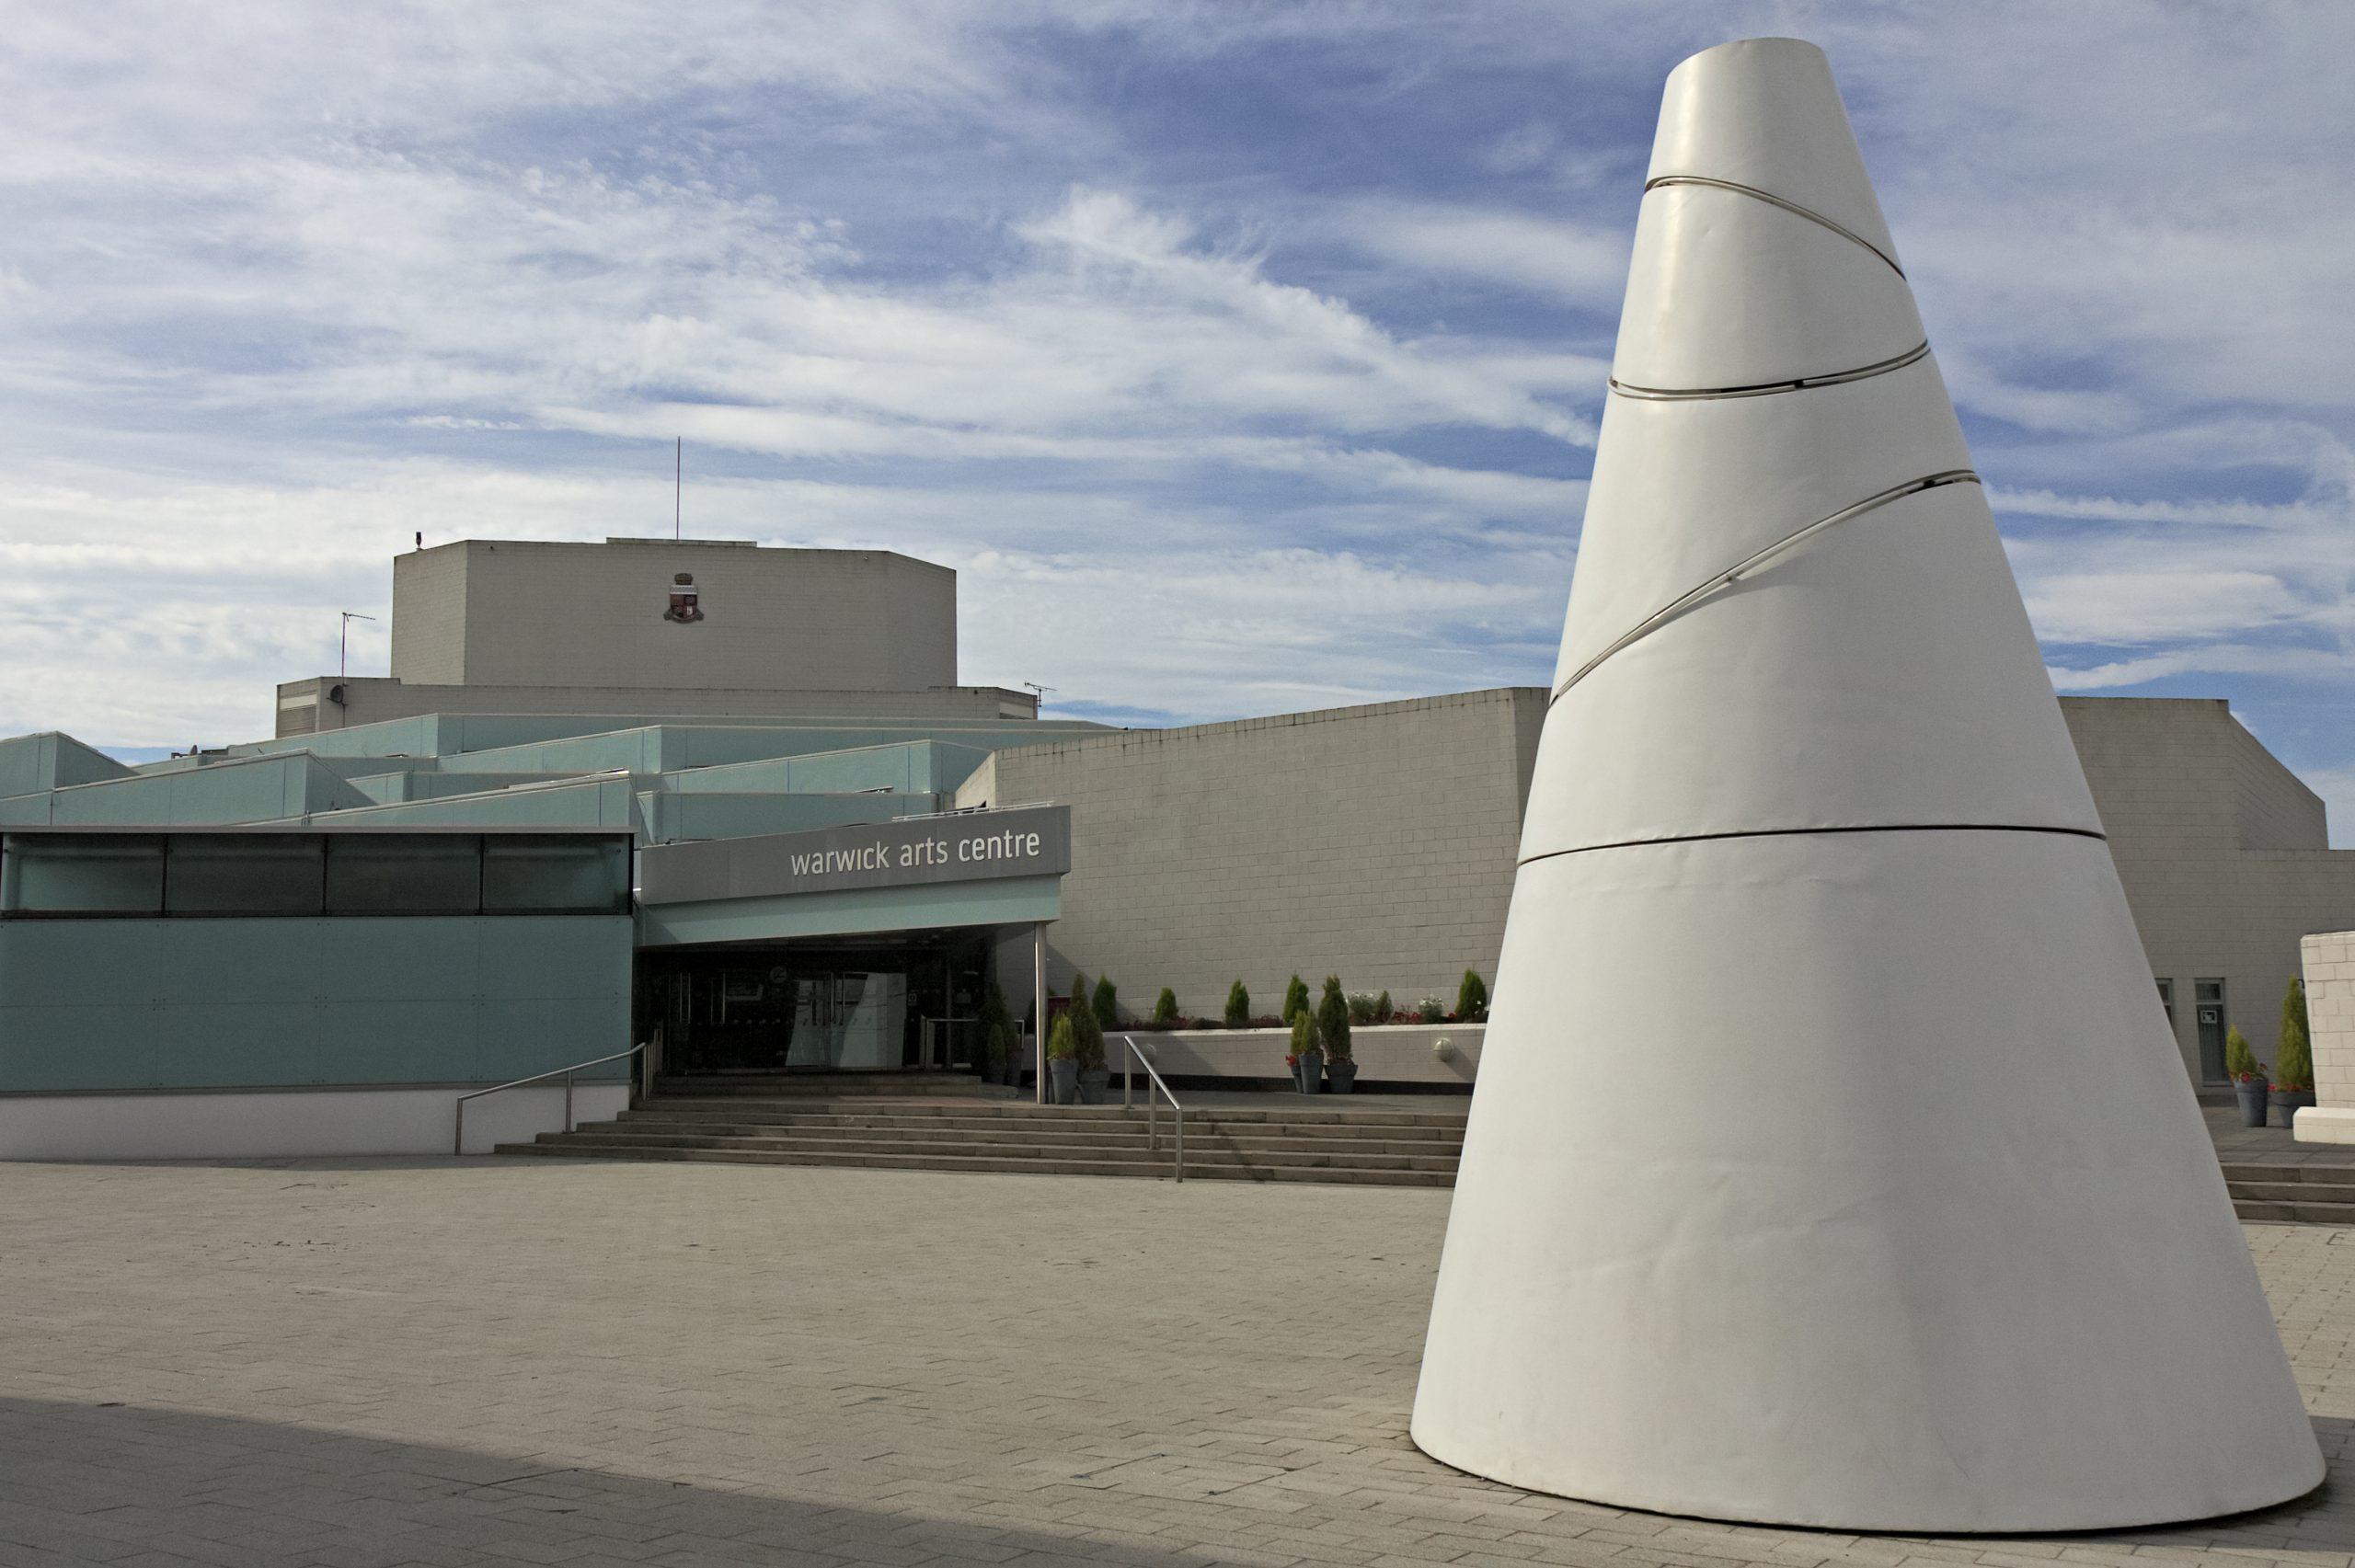 Warwick Arts Center